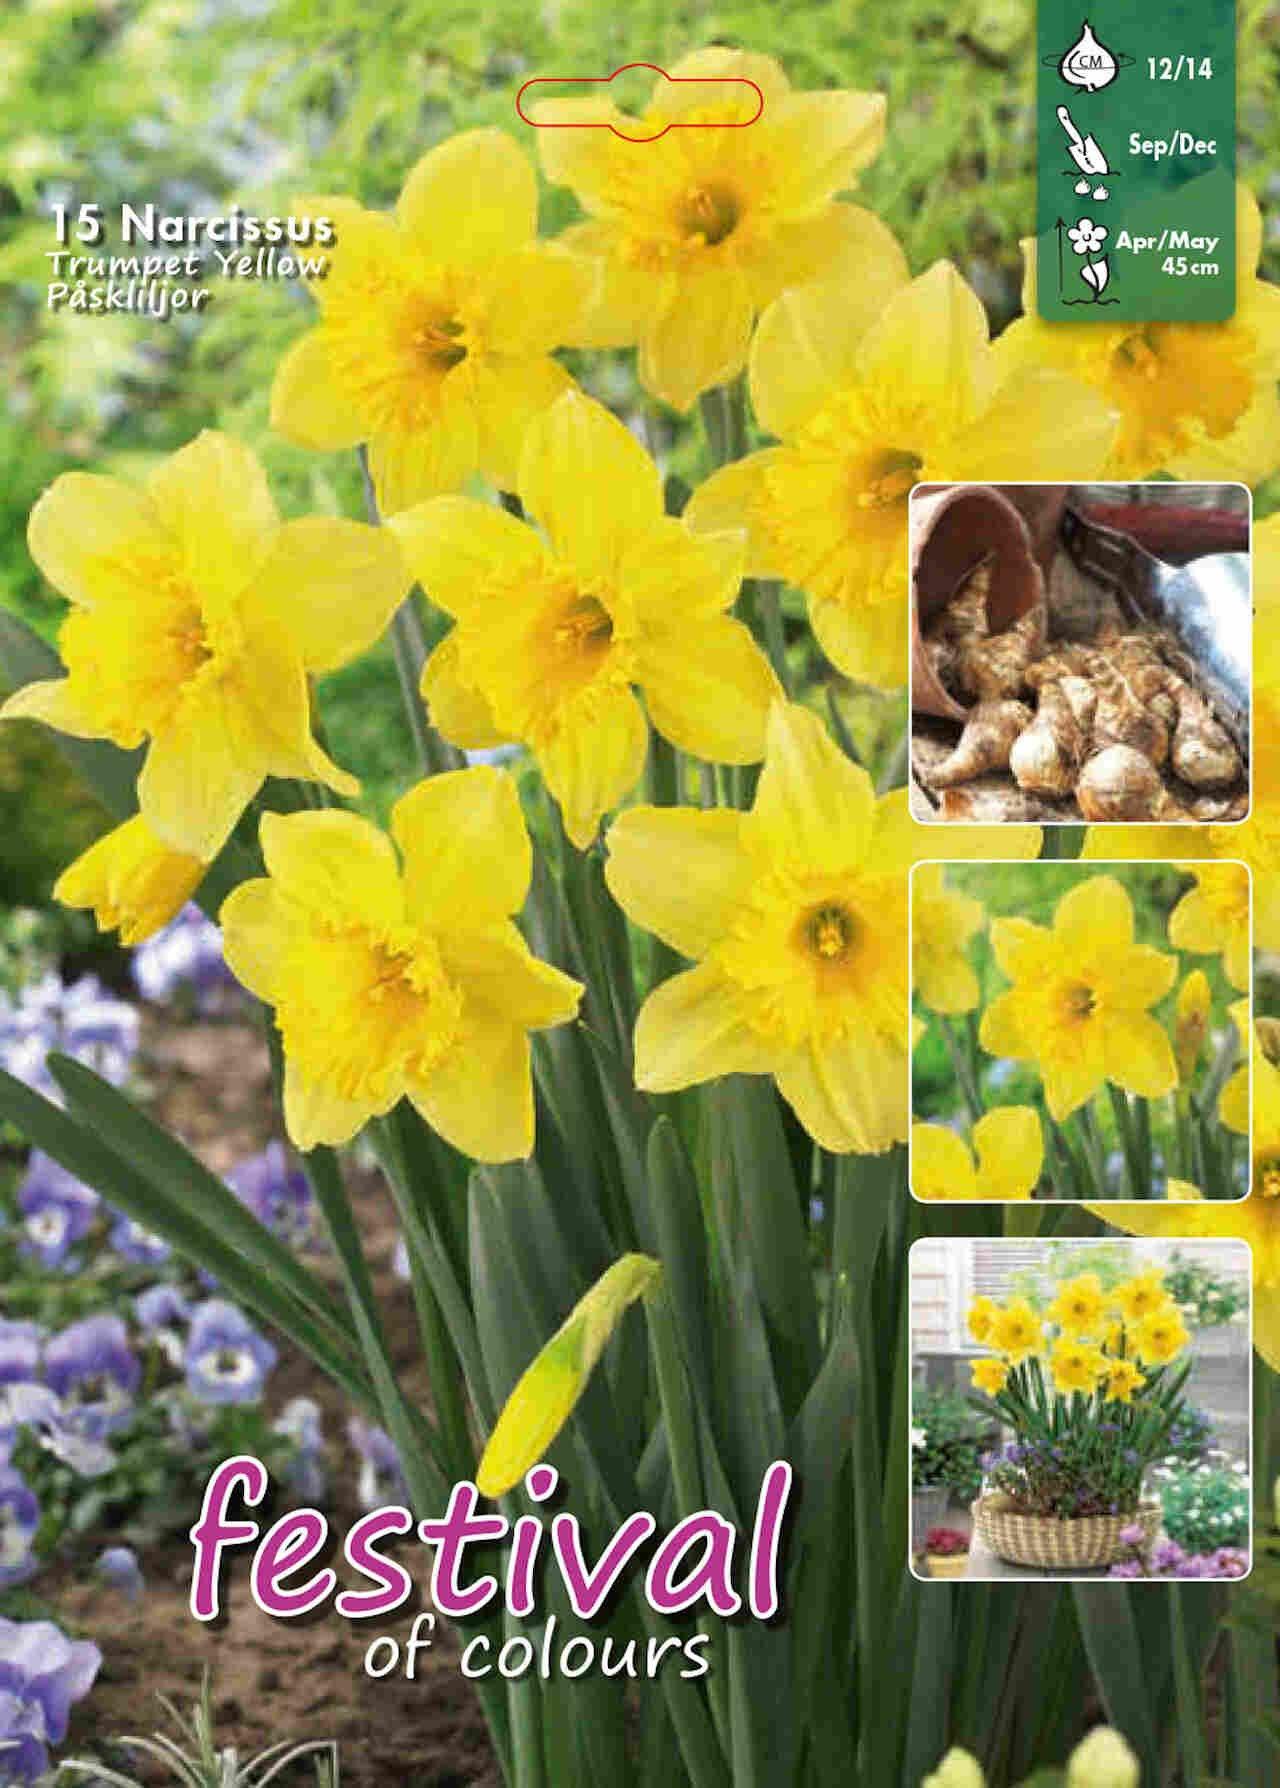 Narcisses Yellow Trompet 12/14